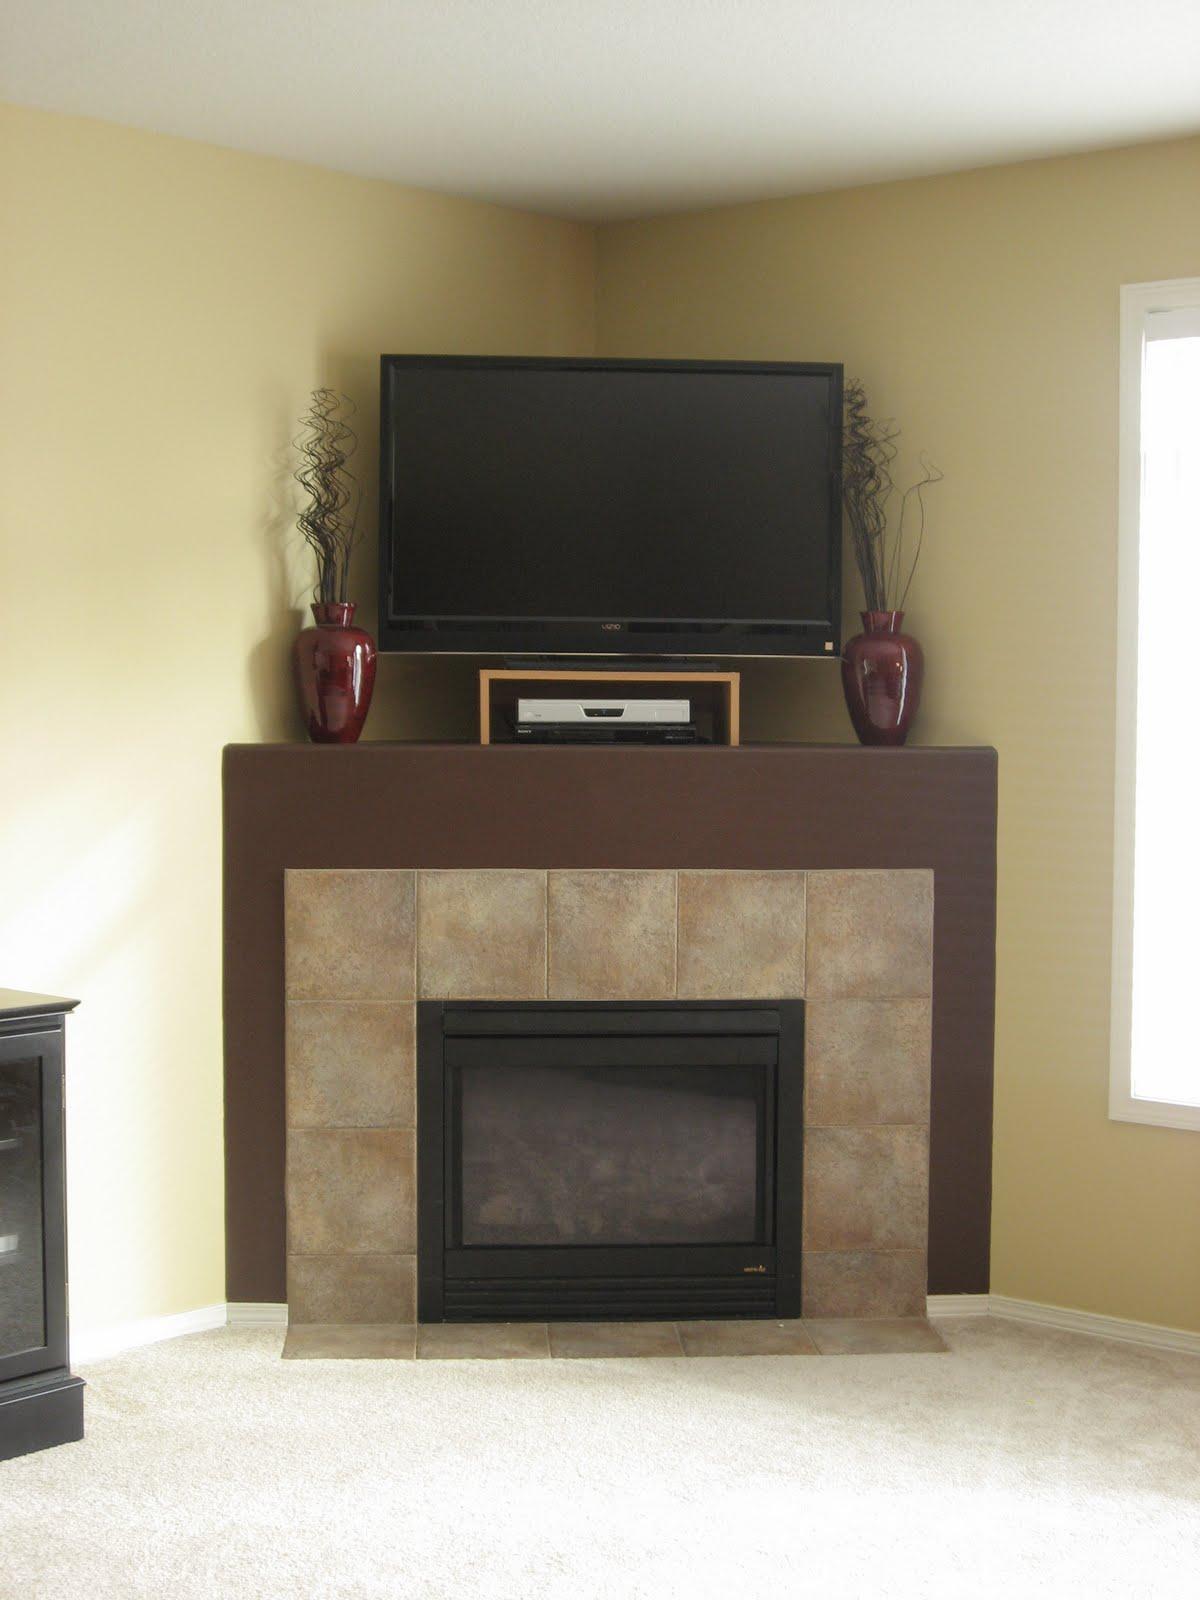 Corner Fireplace Decorating Ideas | DECORATING IDEAS